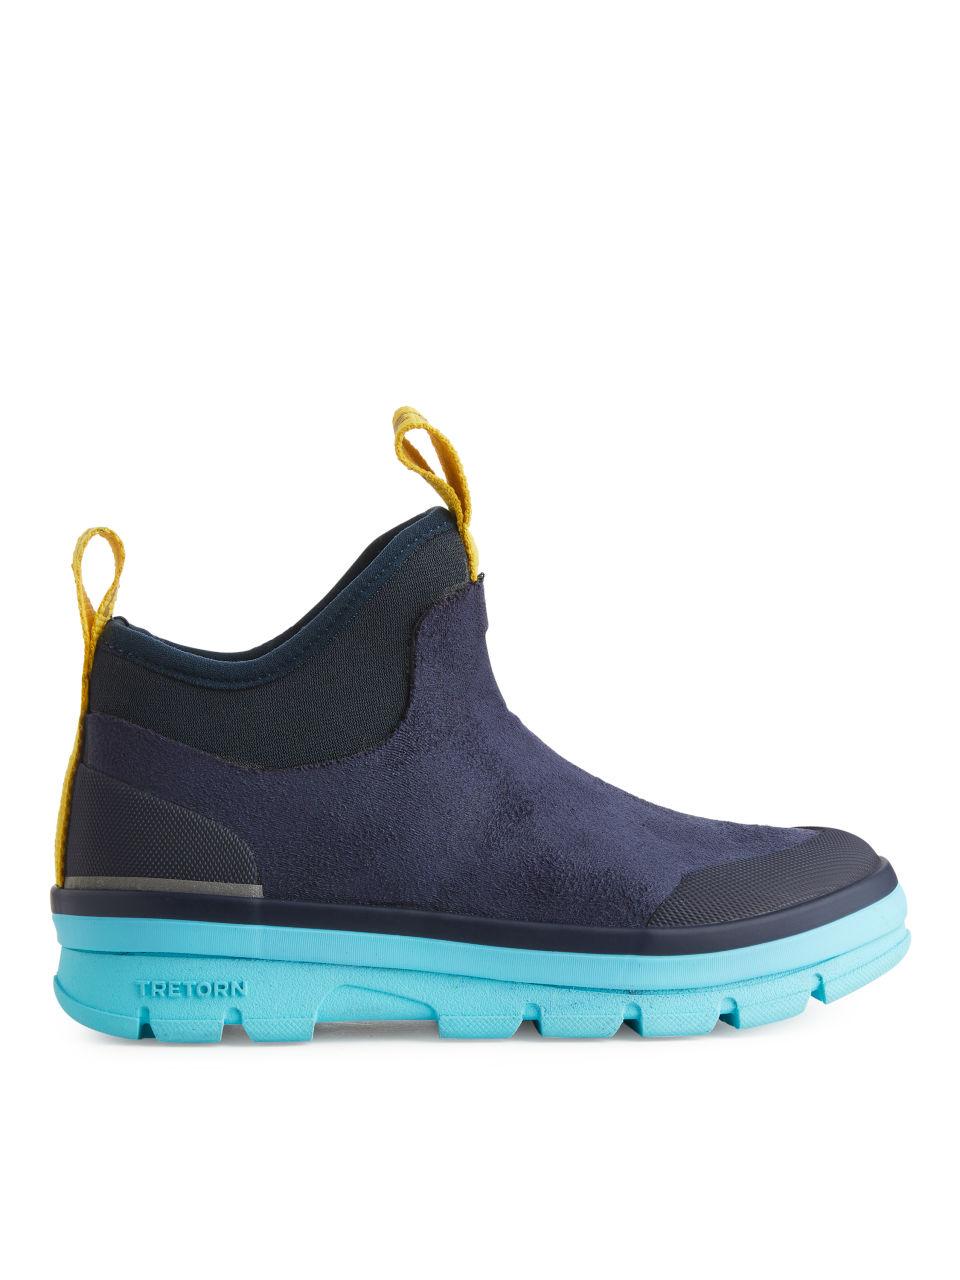 Tretorn Lunar Hybrid Boots - Blue